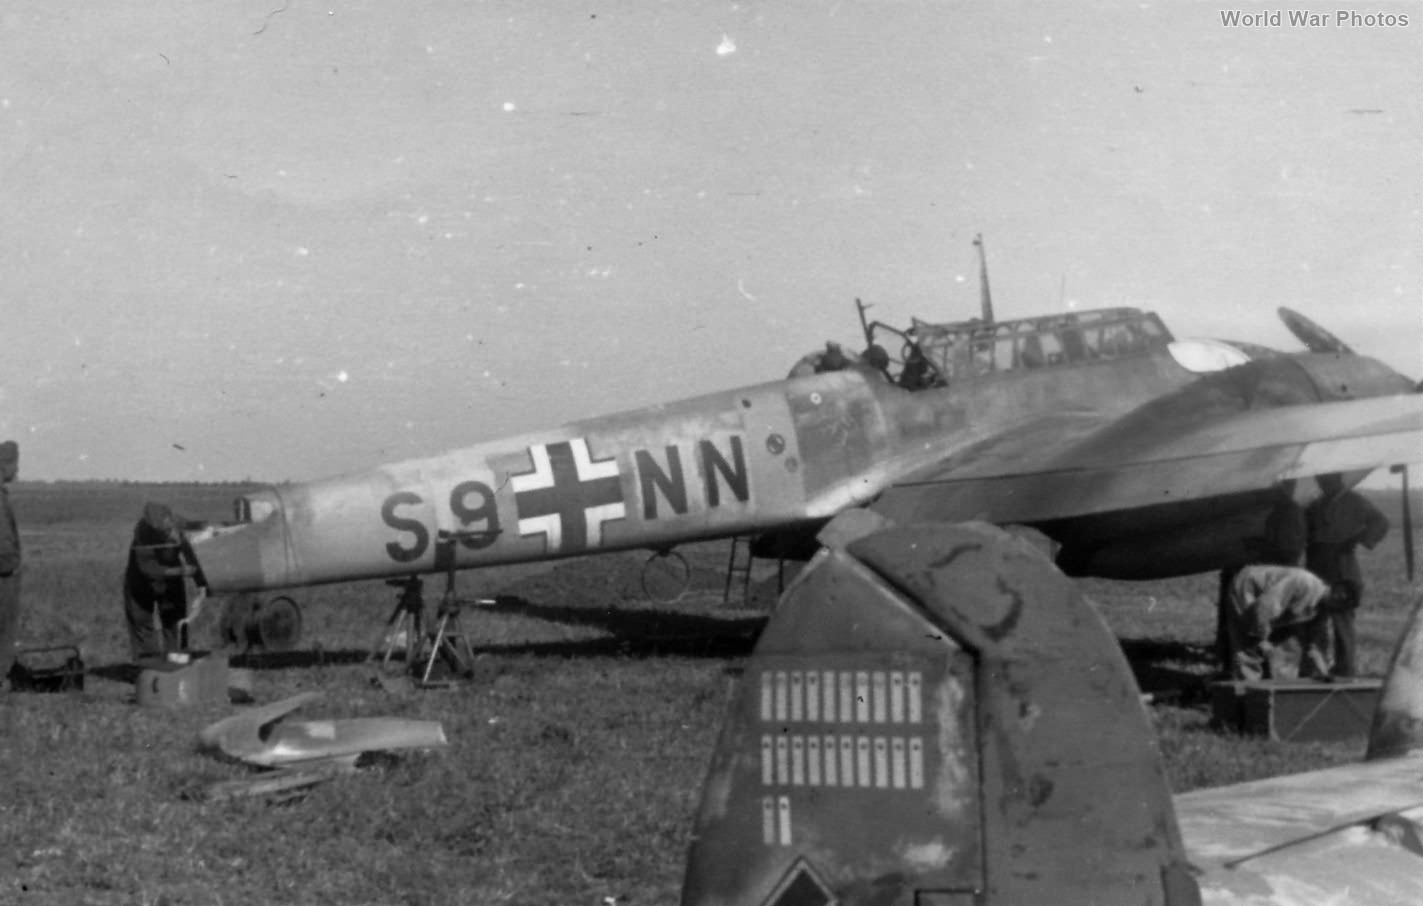 Me 110 S9+NN of the 1/SKG 210